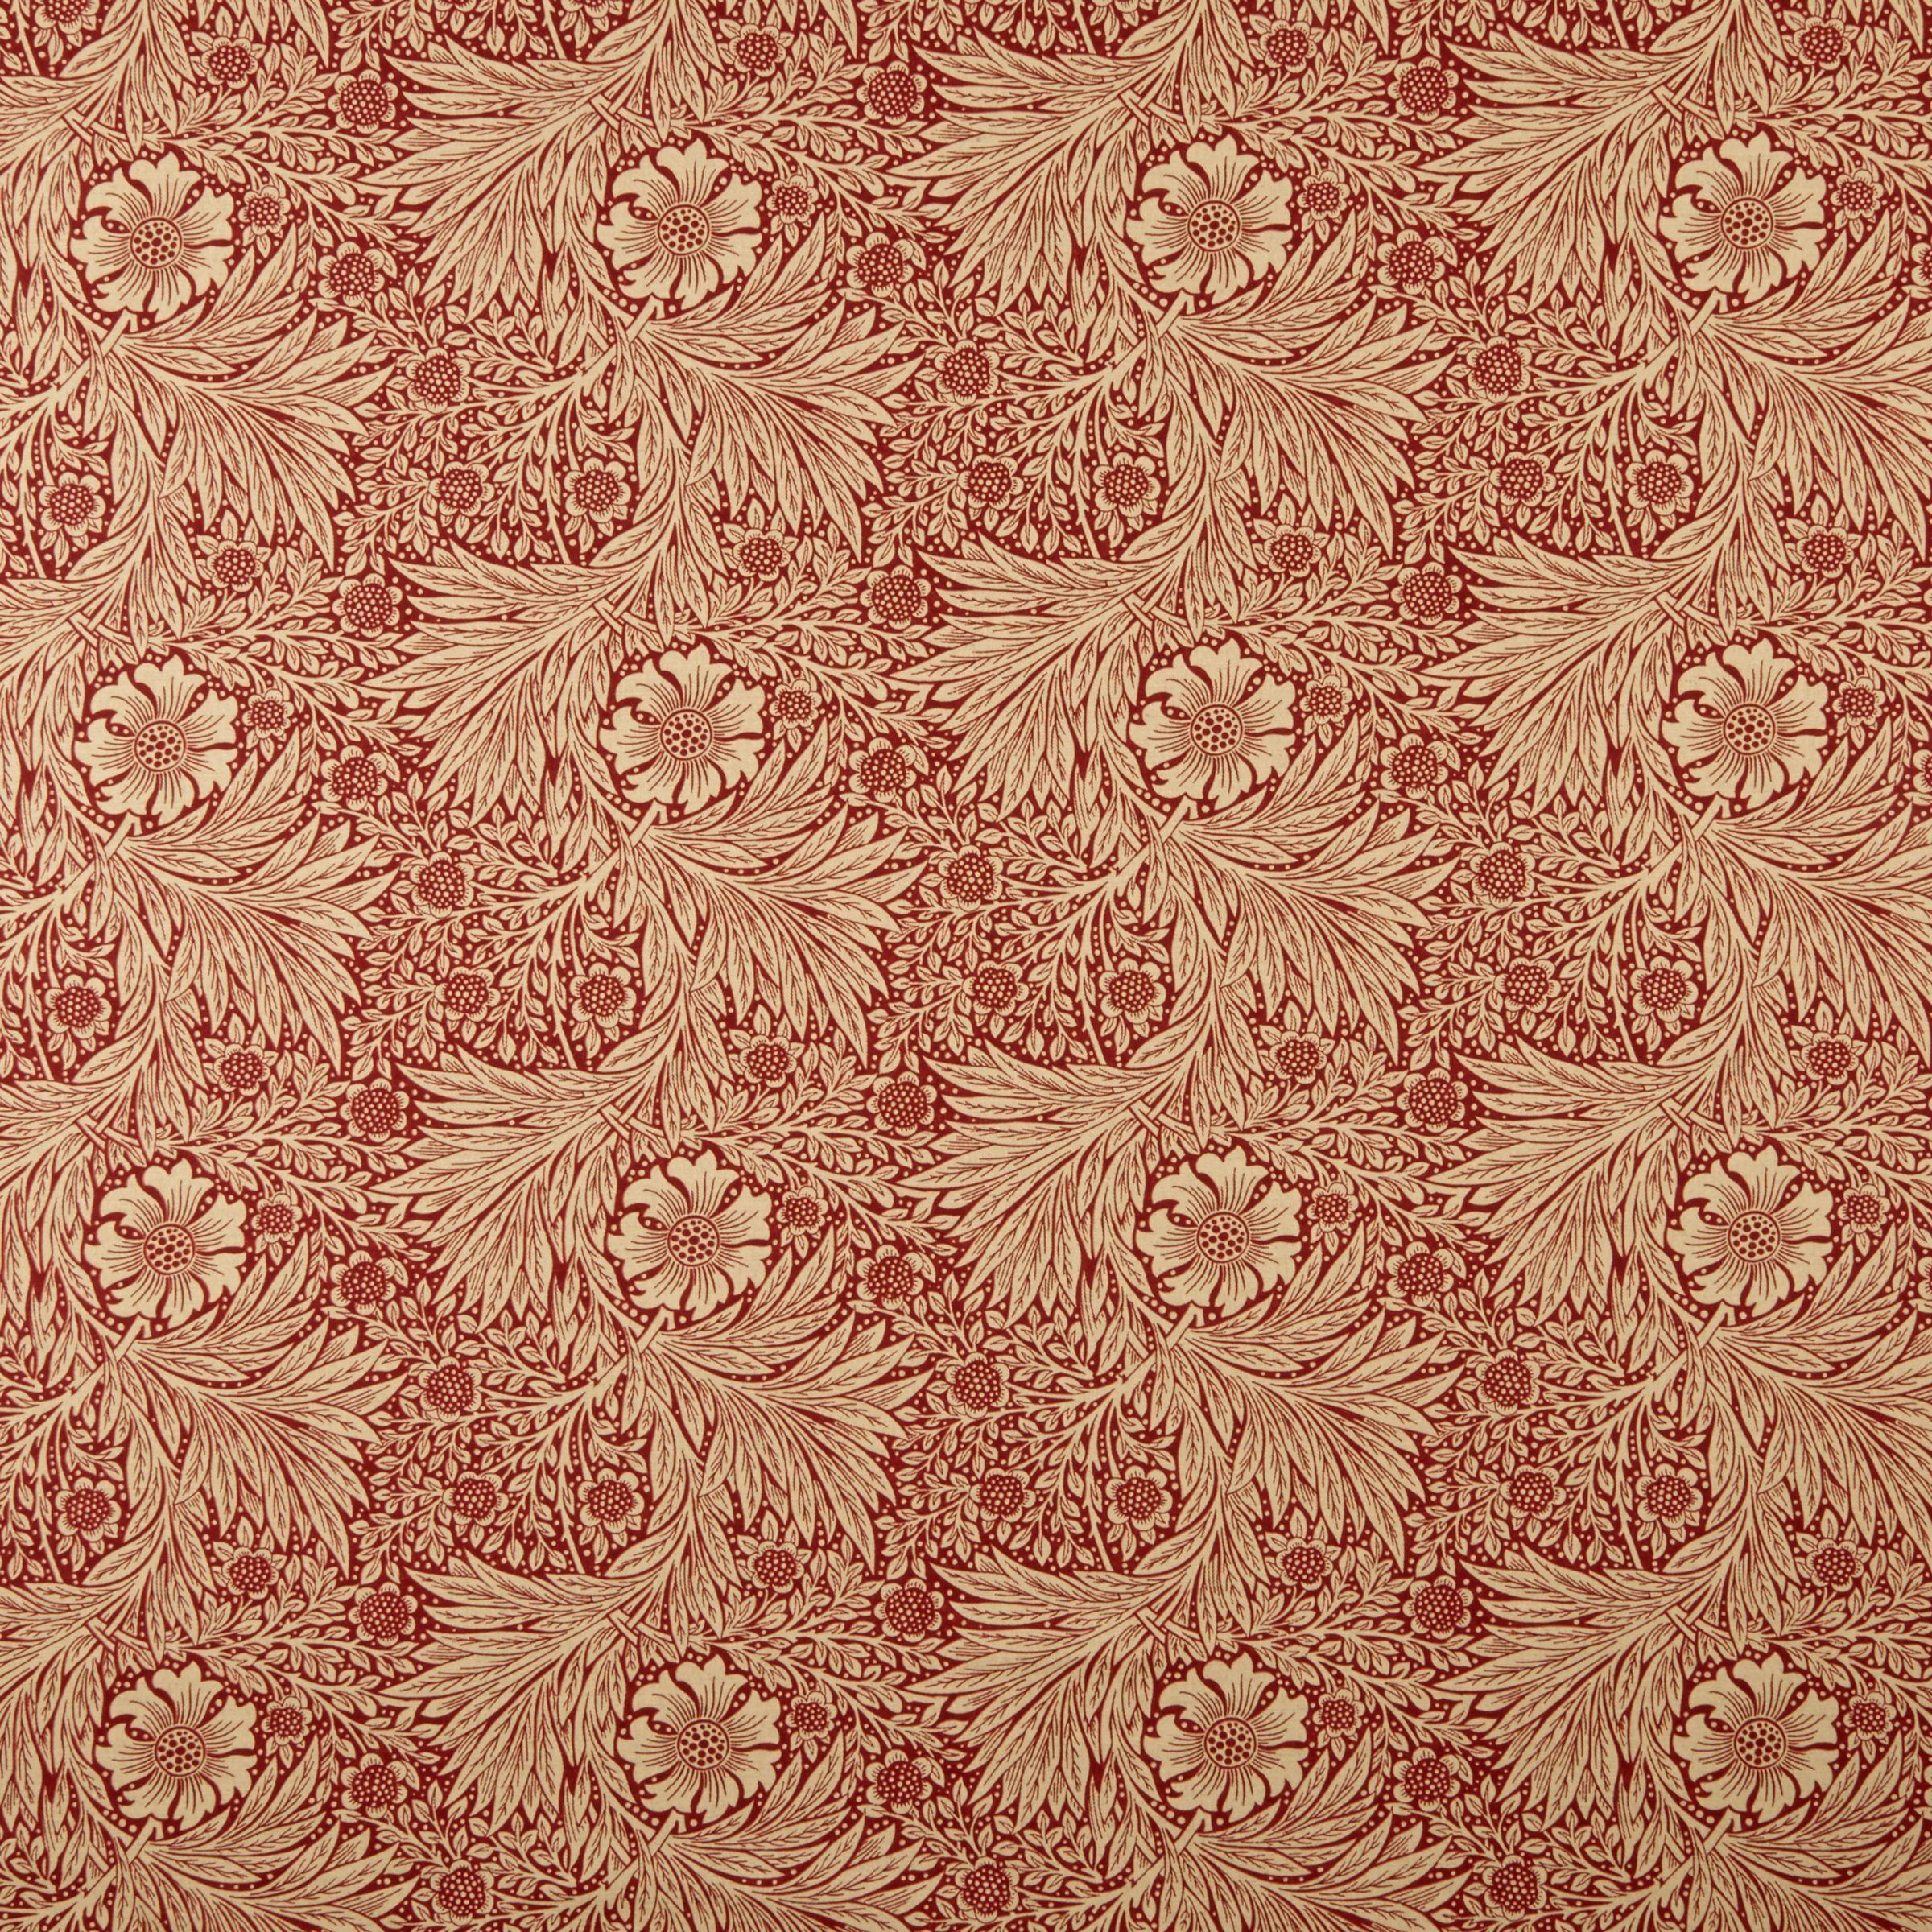 Morris & Co Morris & Co Marigold Furnishing Fabric